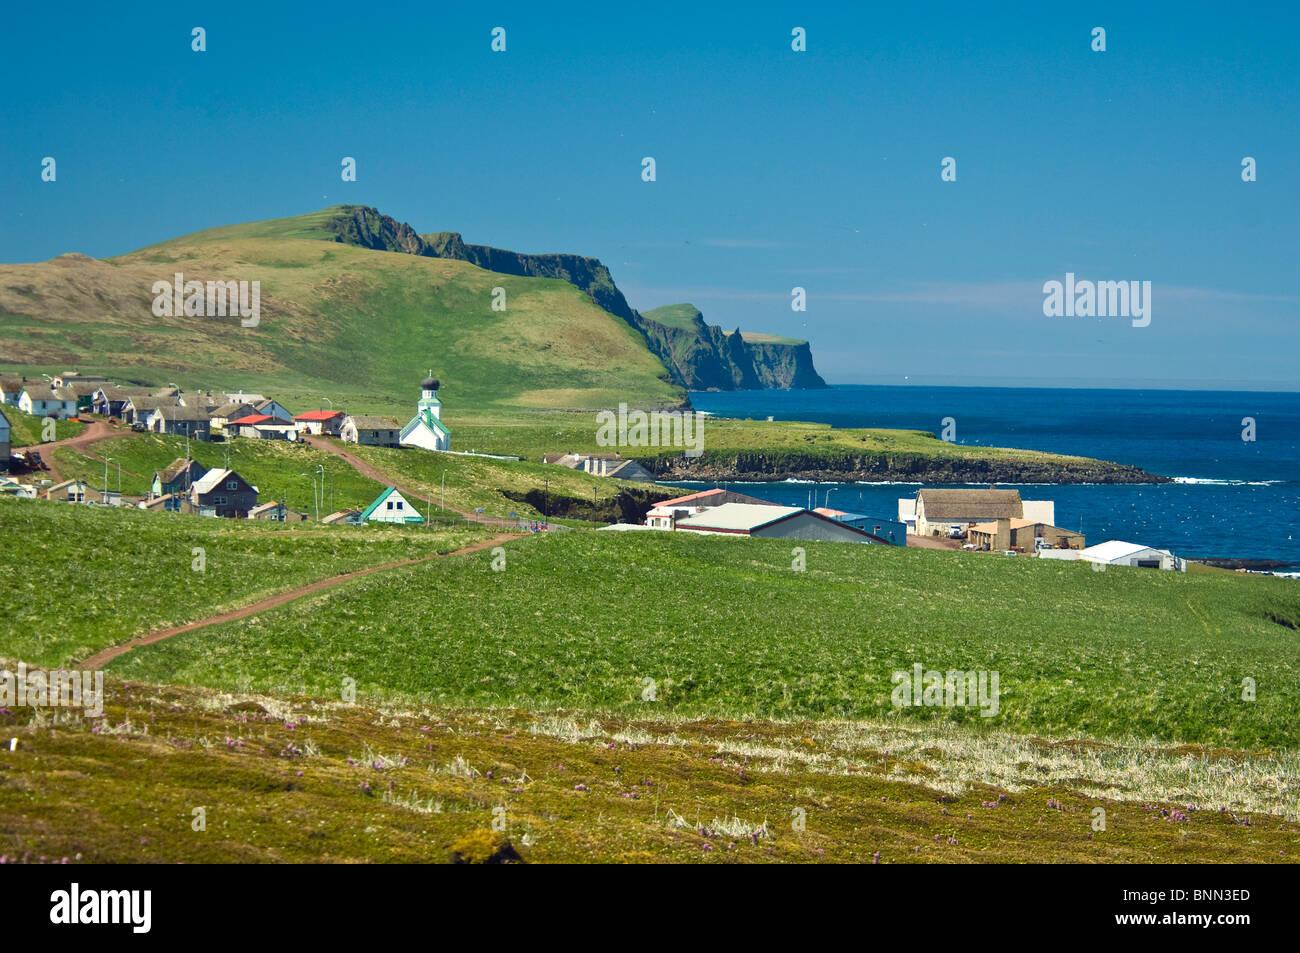 St George In The Pribilof Islands